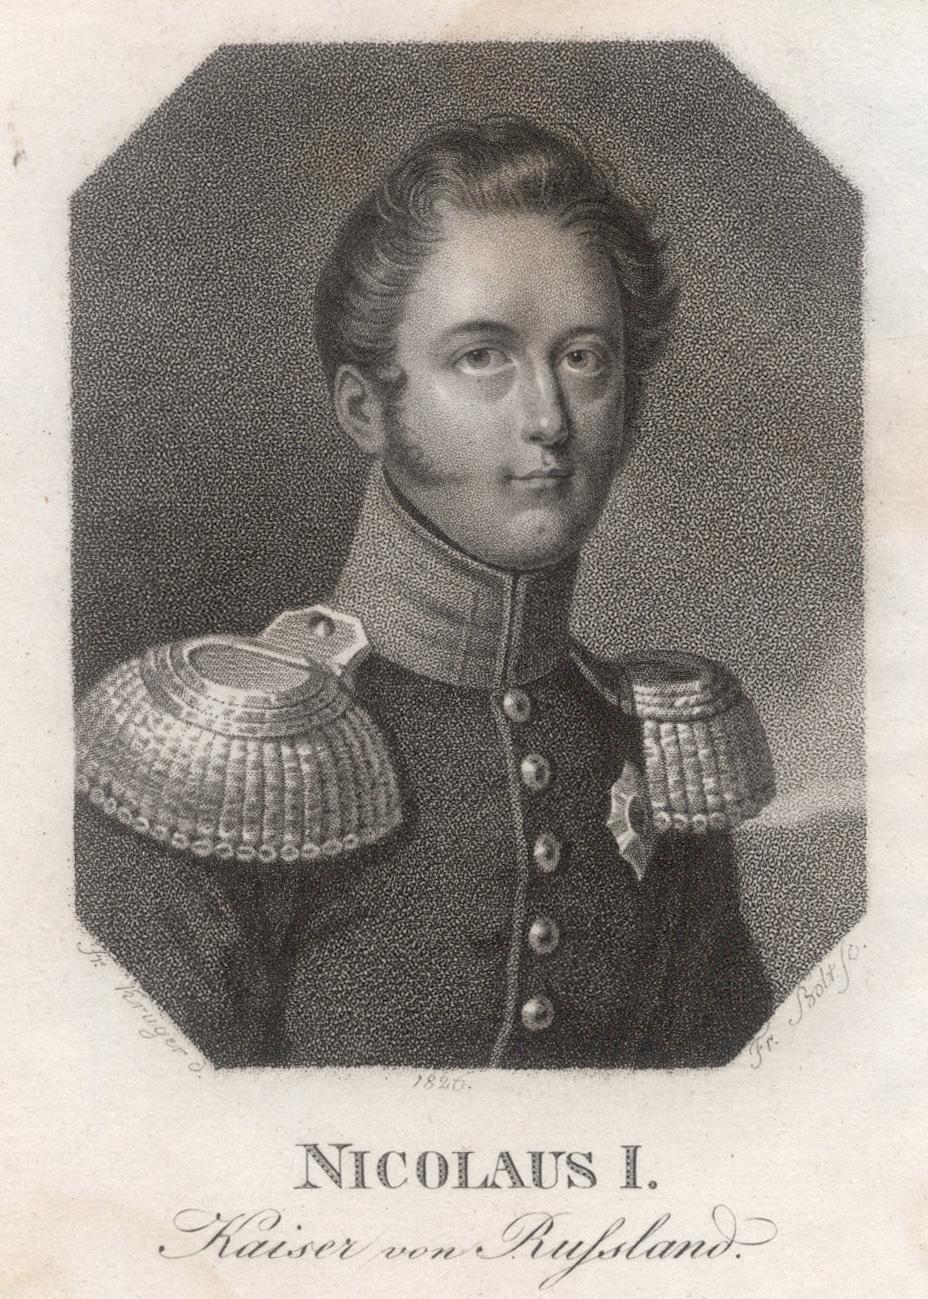 Zarskoje Selo bei Petersburg 06. 07. 1796: NIKOLAUS I. Pawlowitsch